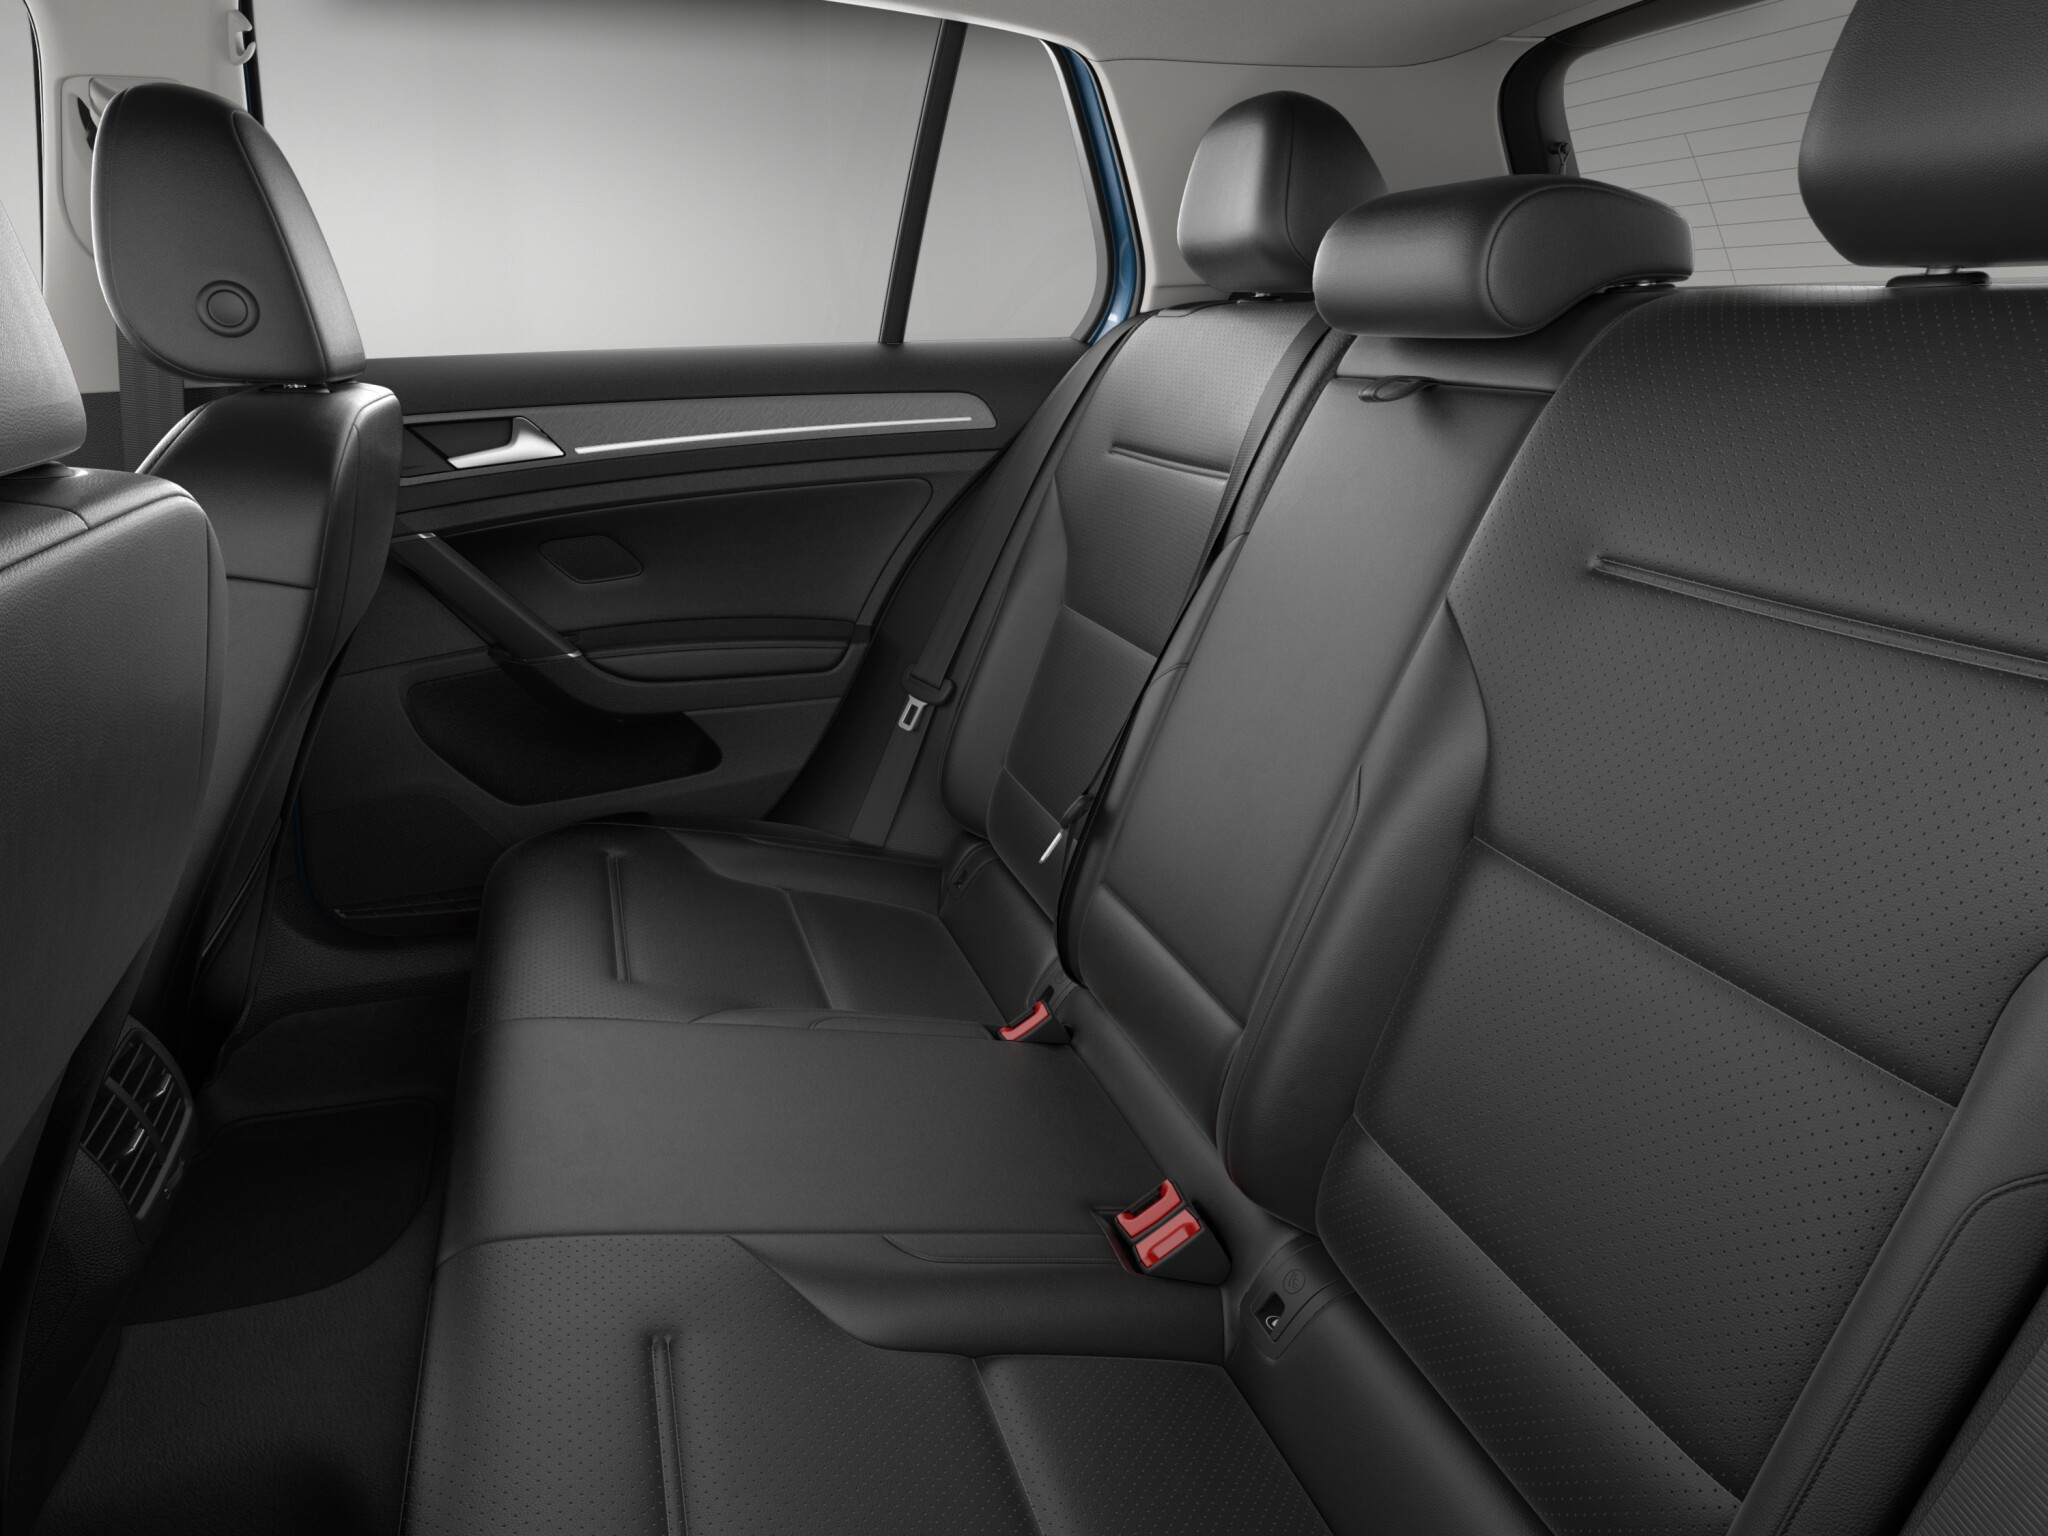 2016 Volkswagen e-Golf Rear Seats Interior